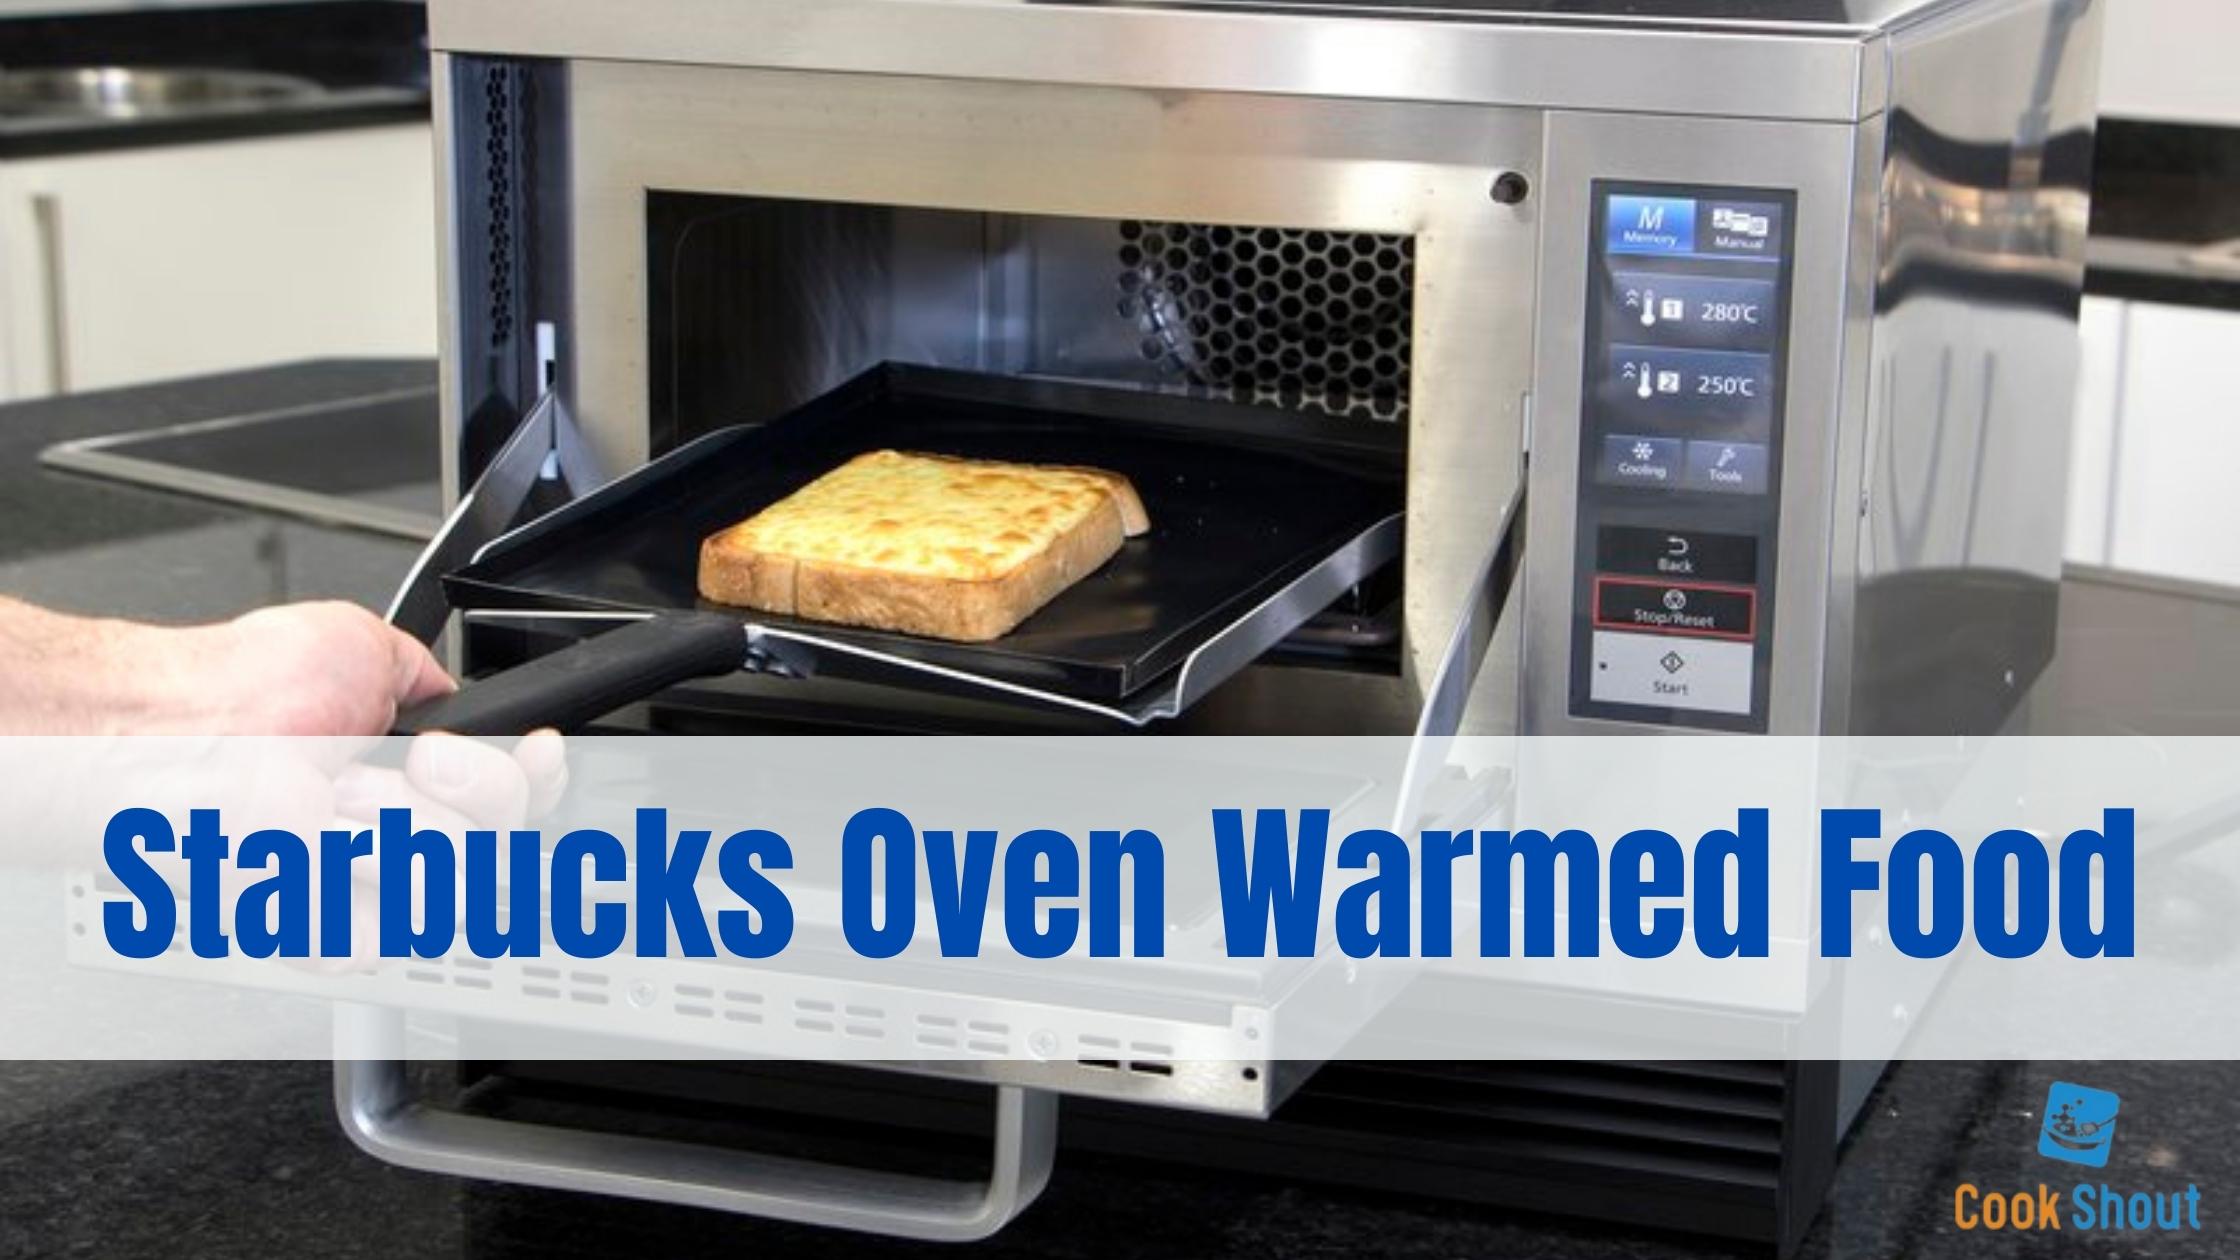 Starbucks Oven Warmed Food